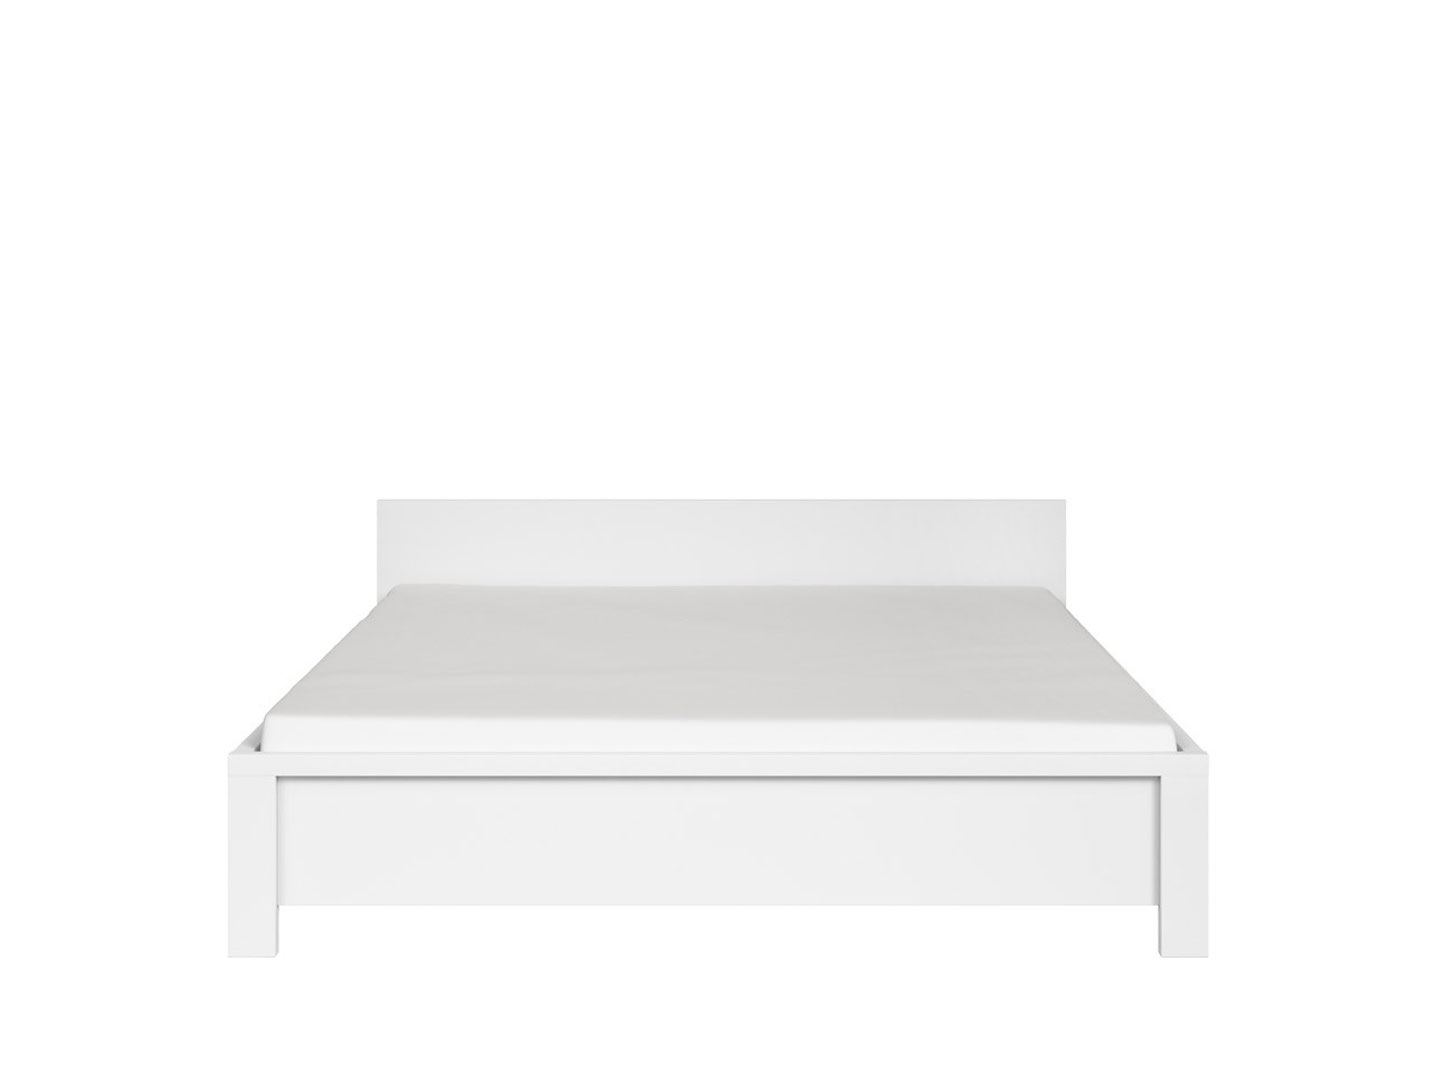 Manželská postel 160 cm - BRW - Kaspian - LOZ/160 (bílá + bílá matná)